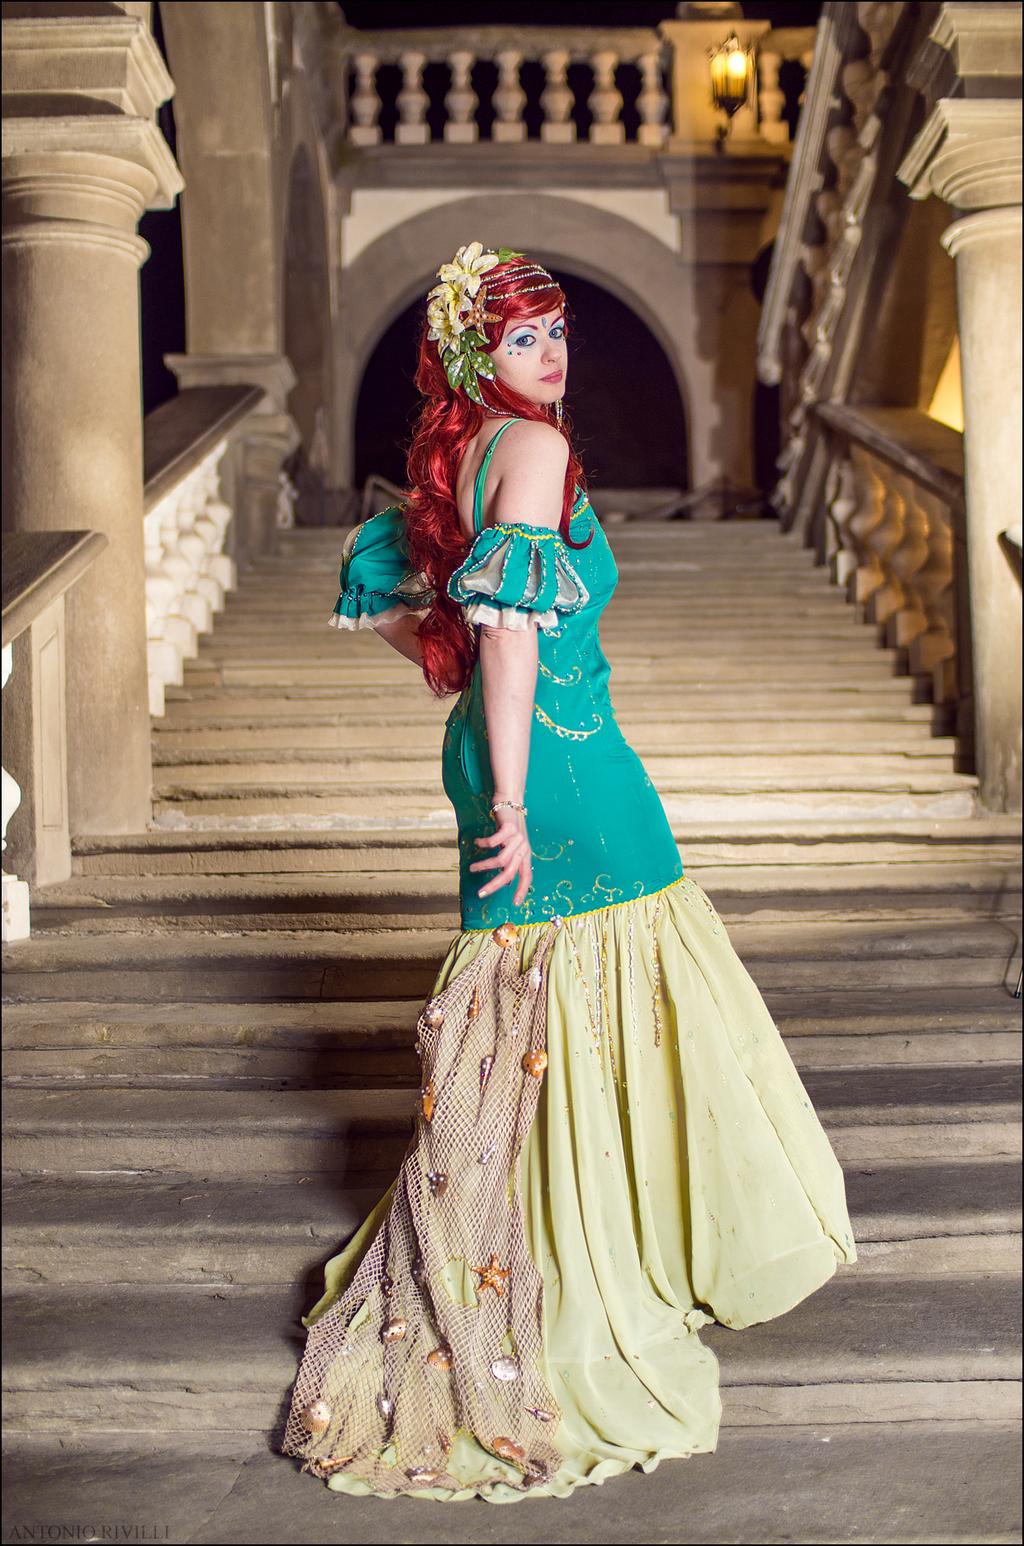 Ariel Art Nouveau 6 by Runarea